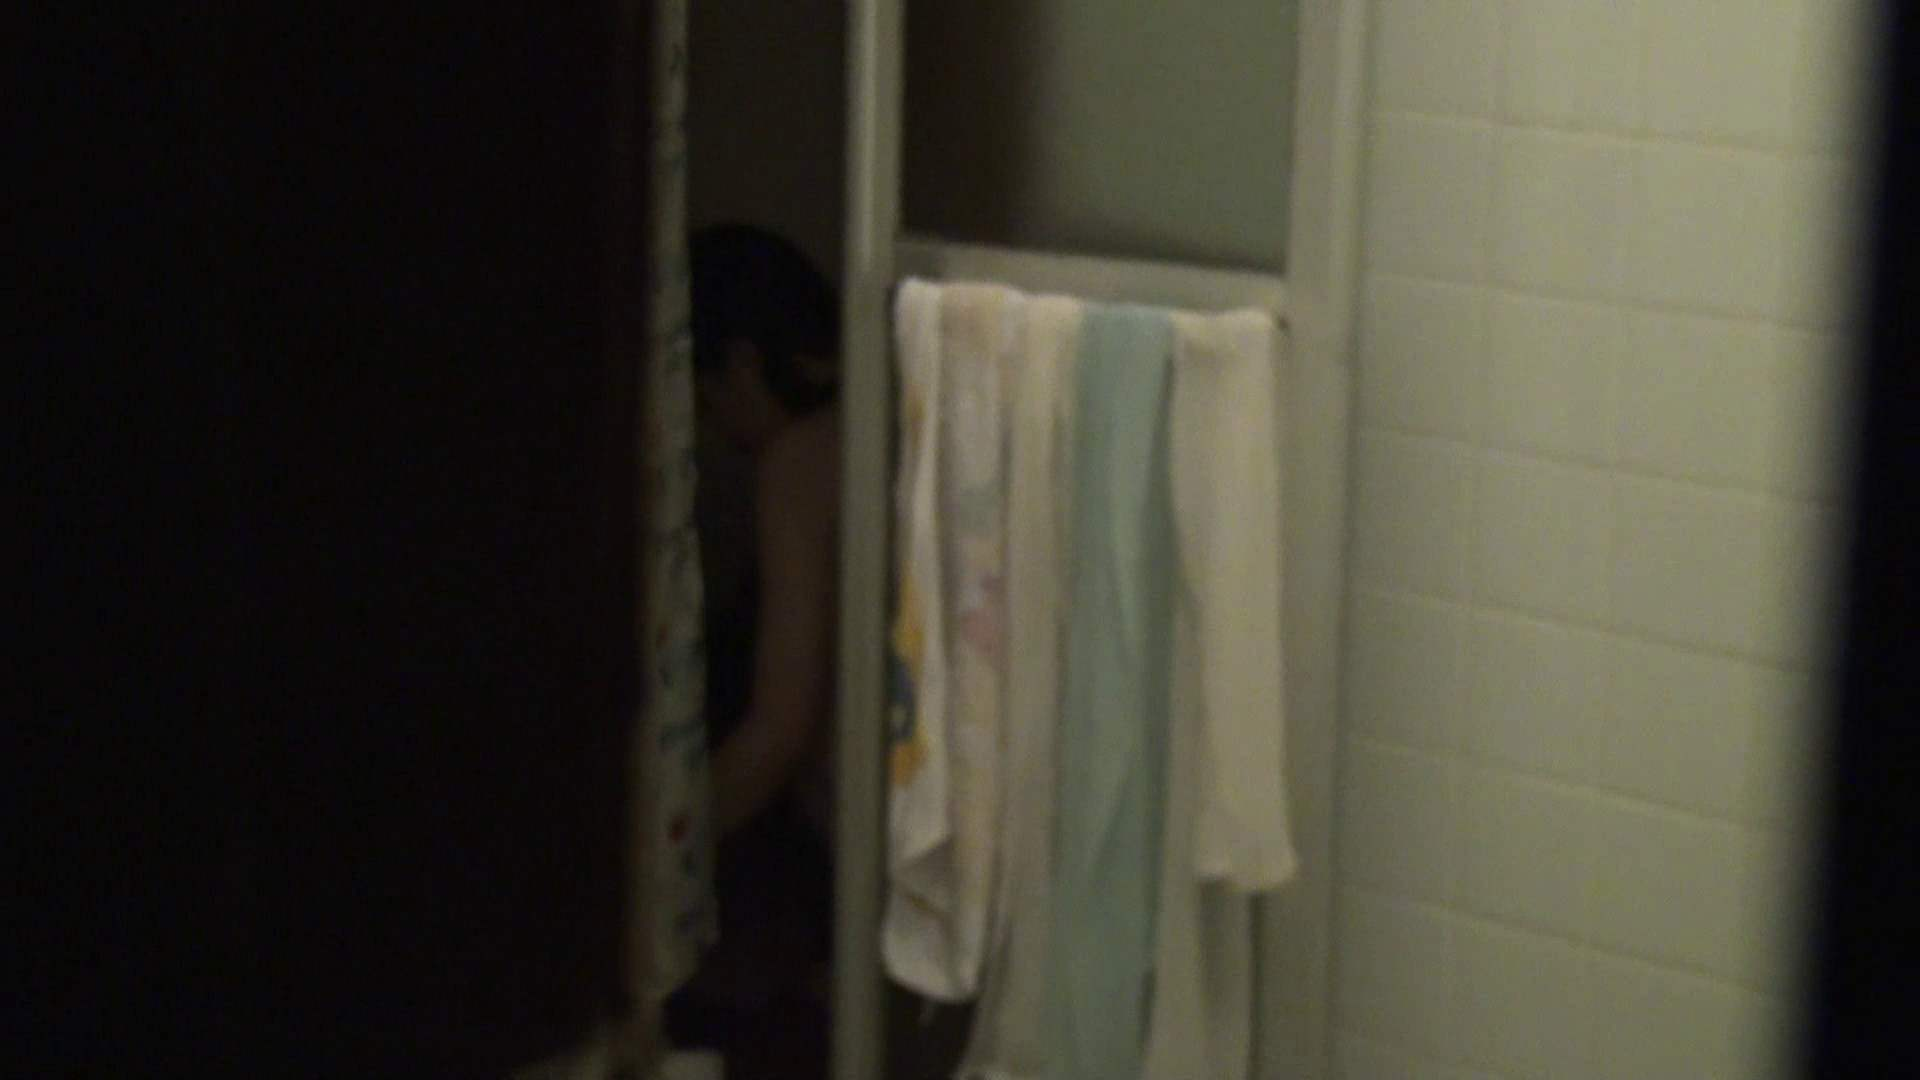 vol.06顔を洗い流す極上お女市さんの裸体をハイビジョンで!風呂上り着替え必見! 着替え オメコ無修正動画無料 84pic 76